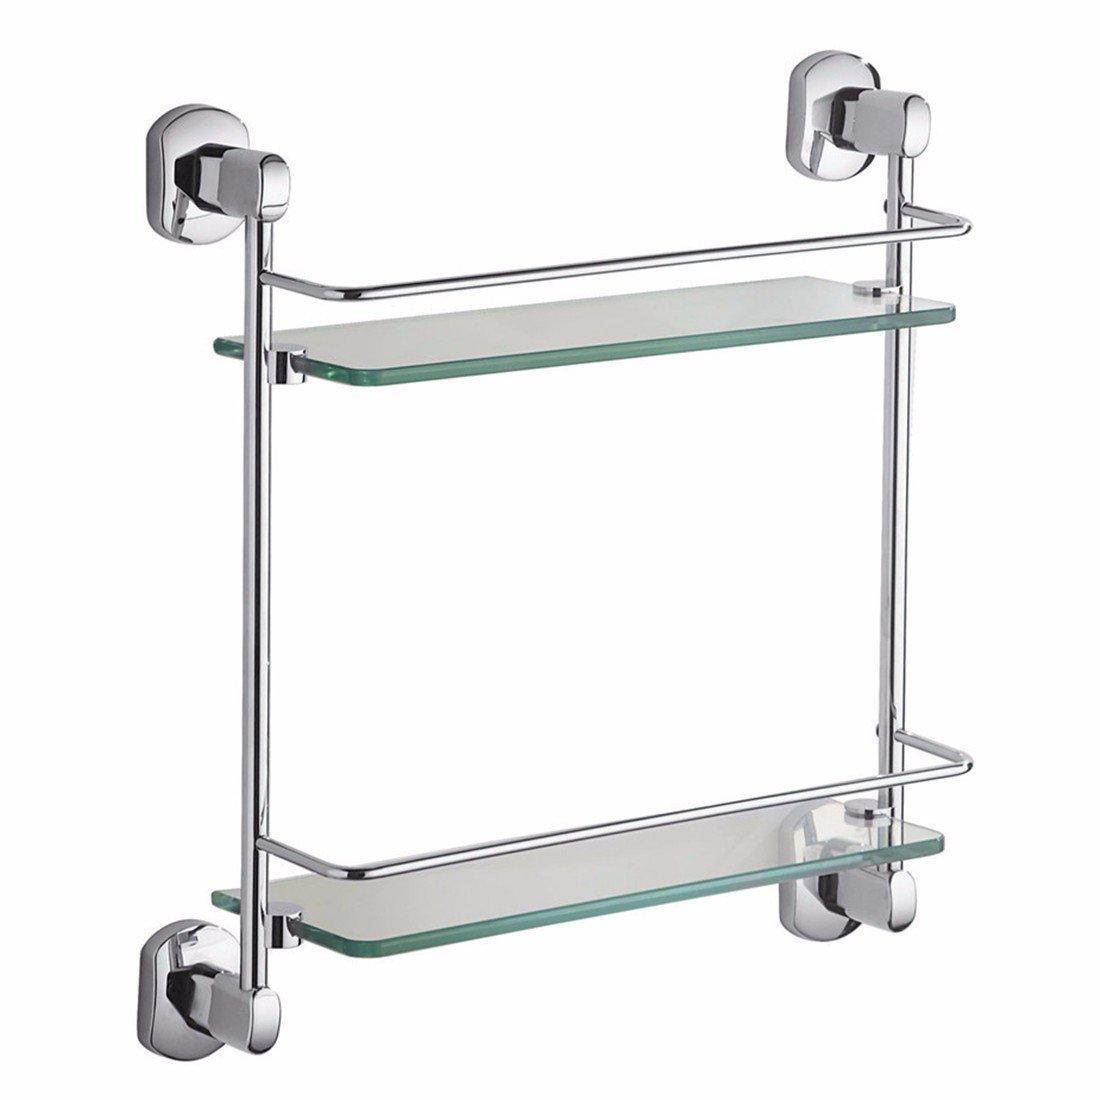 LAONA Modern European alloy chrome plated oval base, bathroom pendant set, towel bar, toilet paper rack,Rack 2